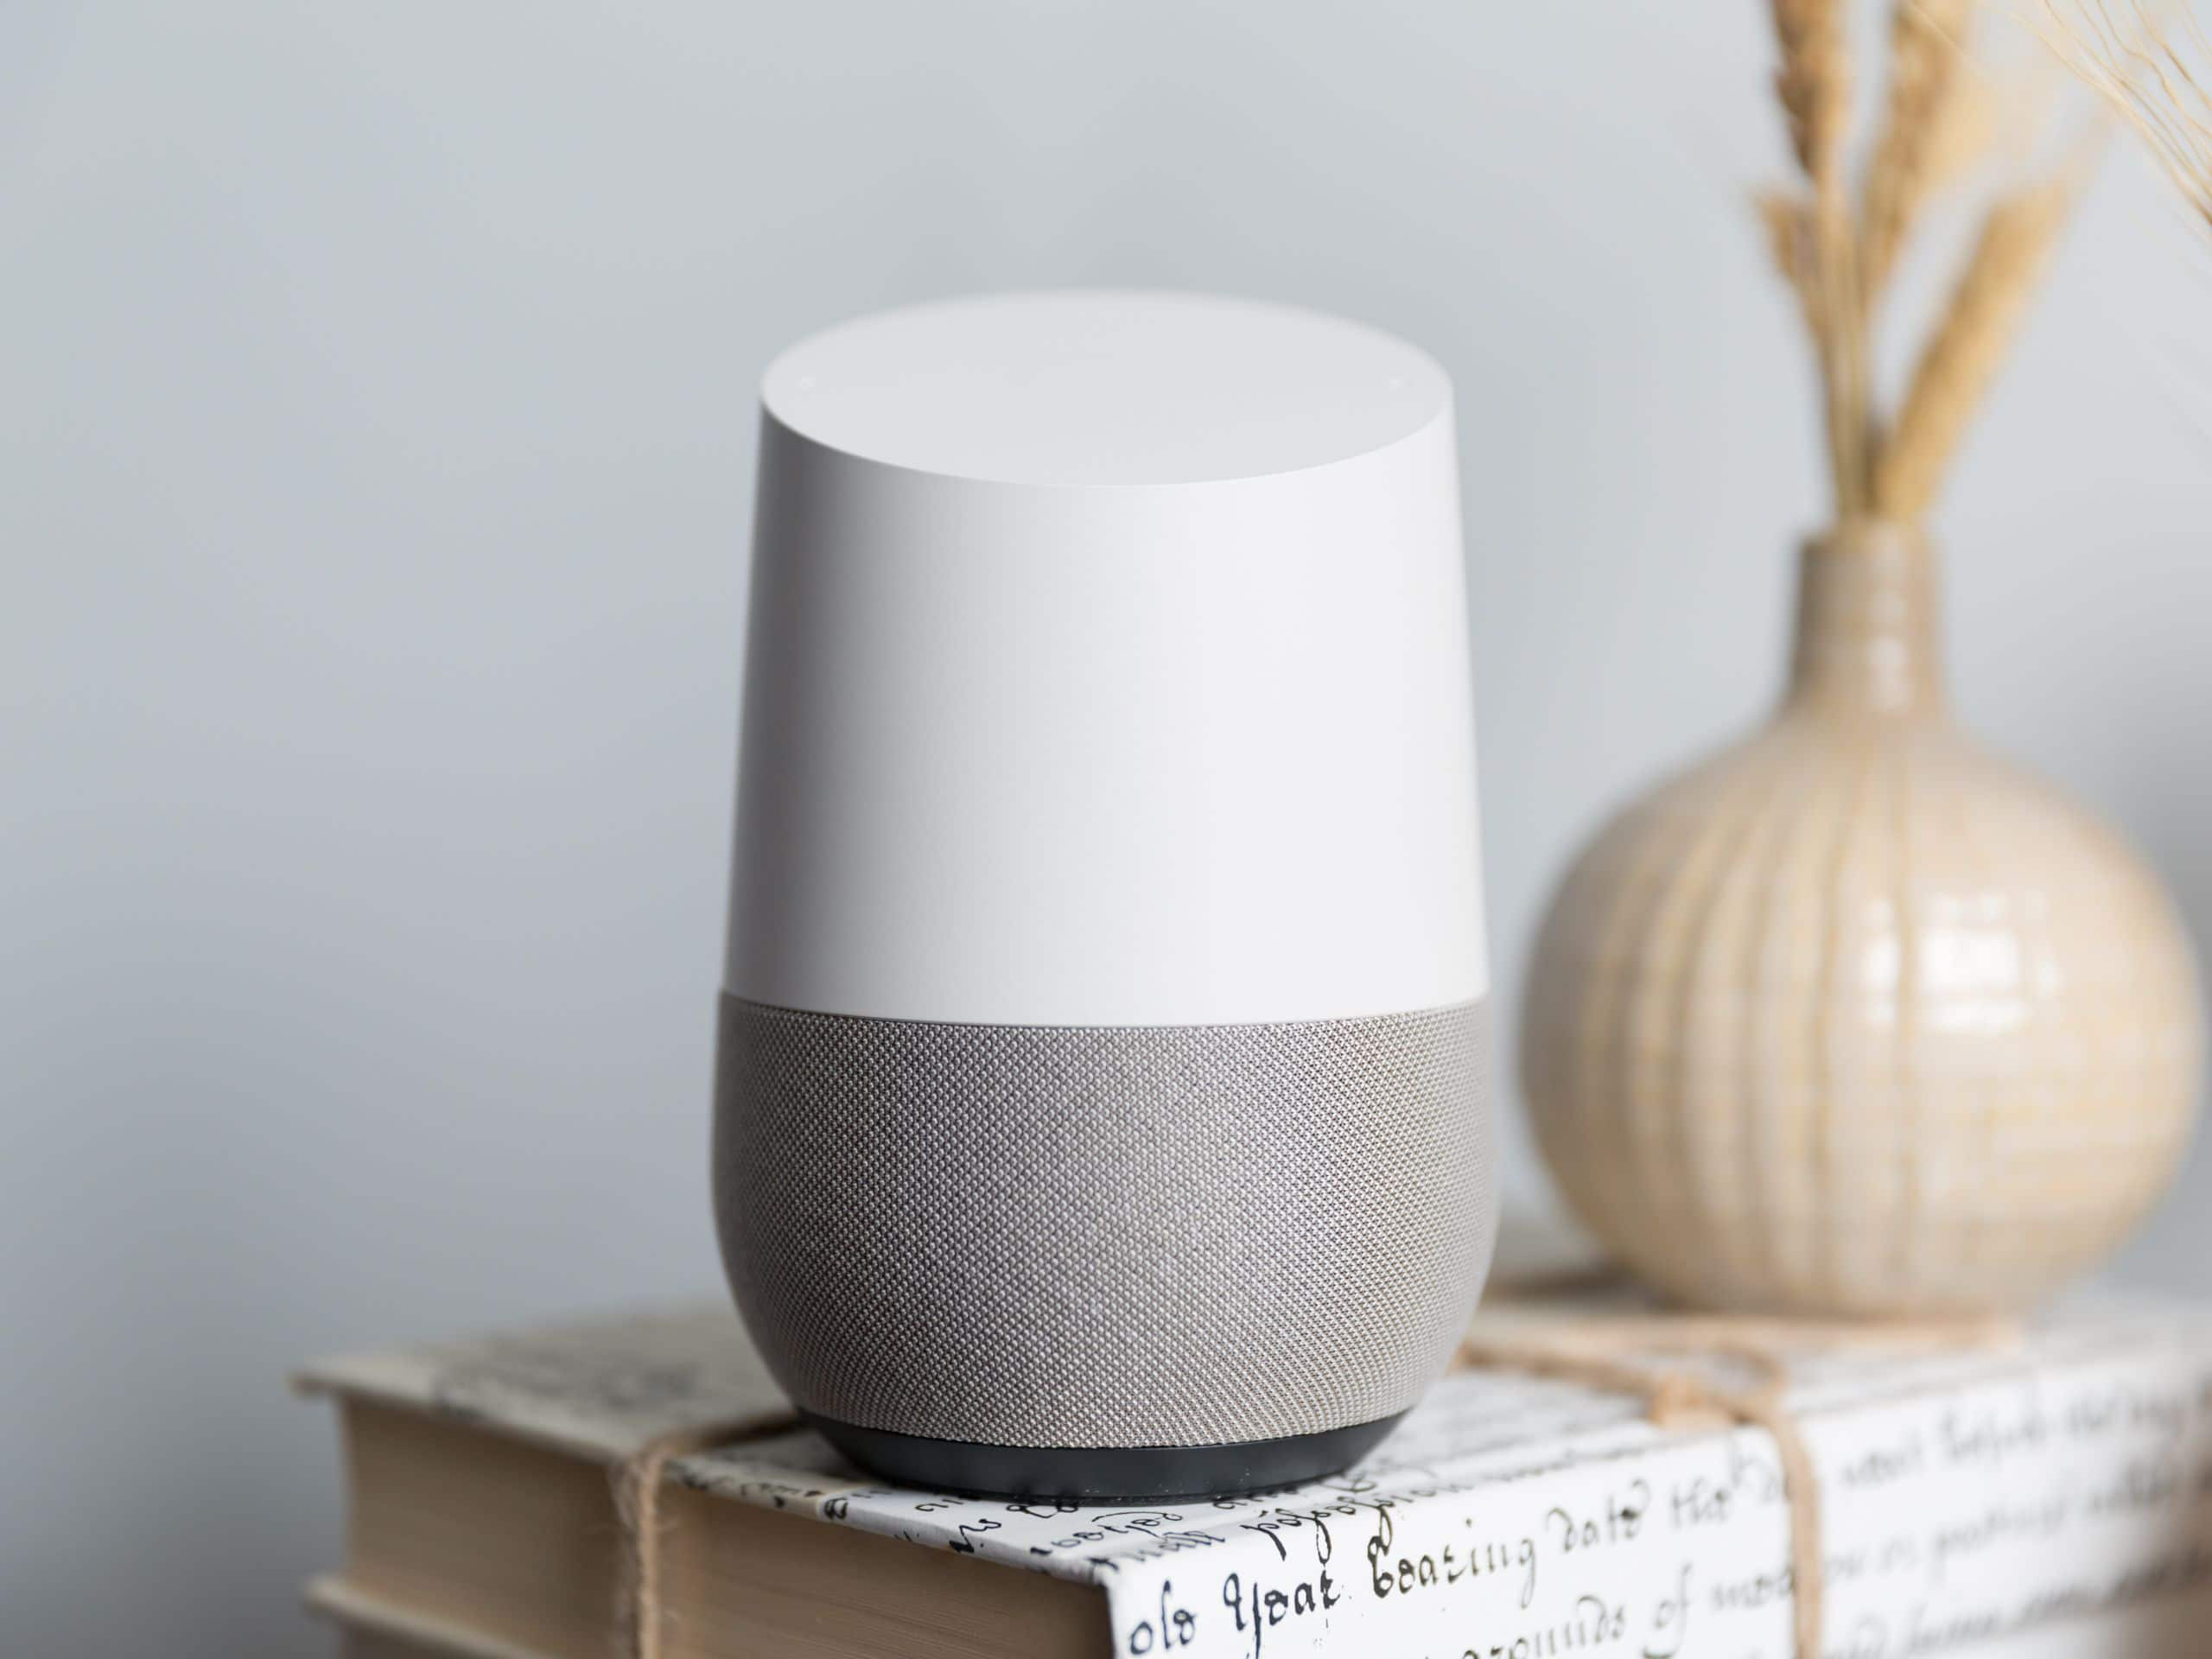 Google-home-product-photo-1.jpg